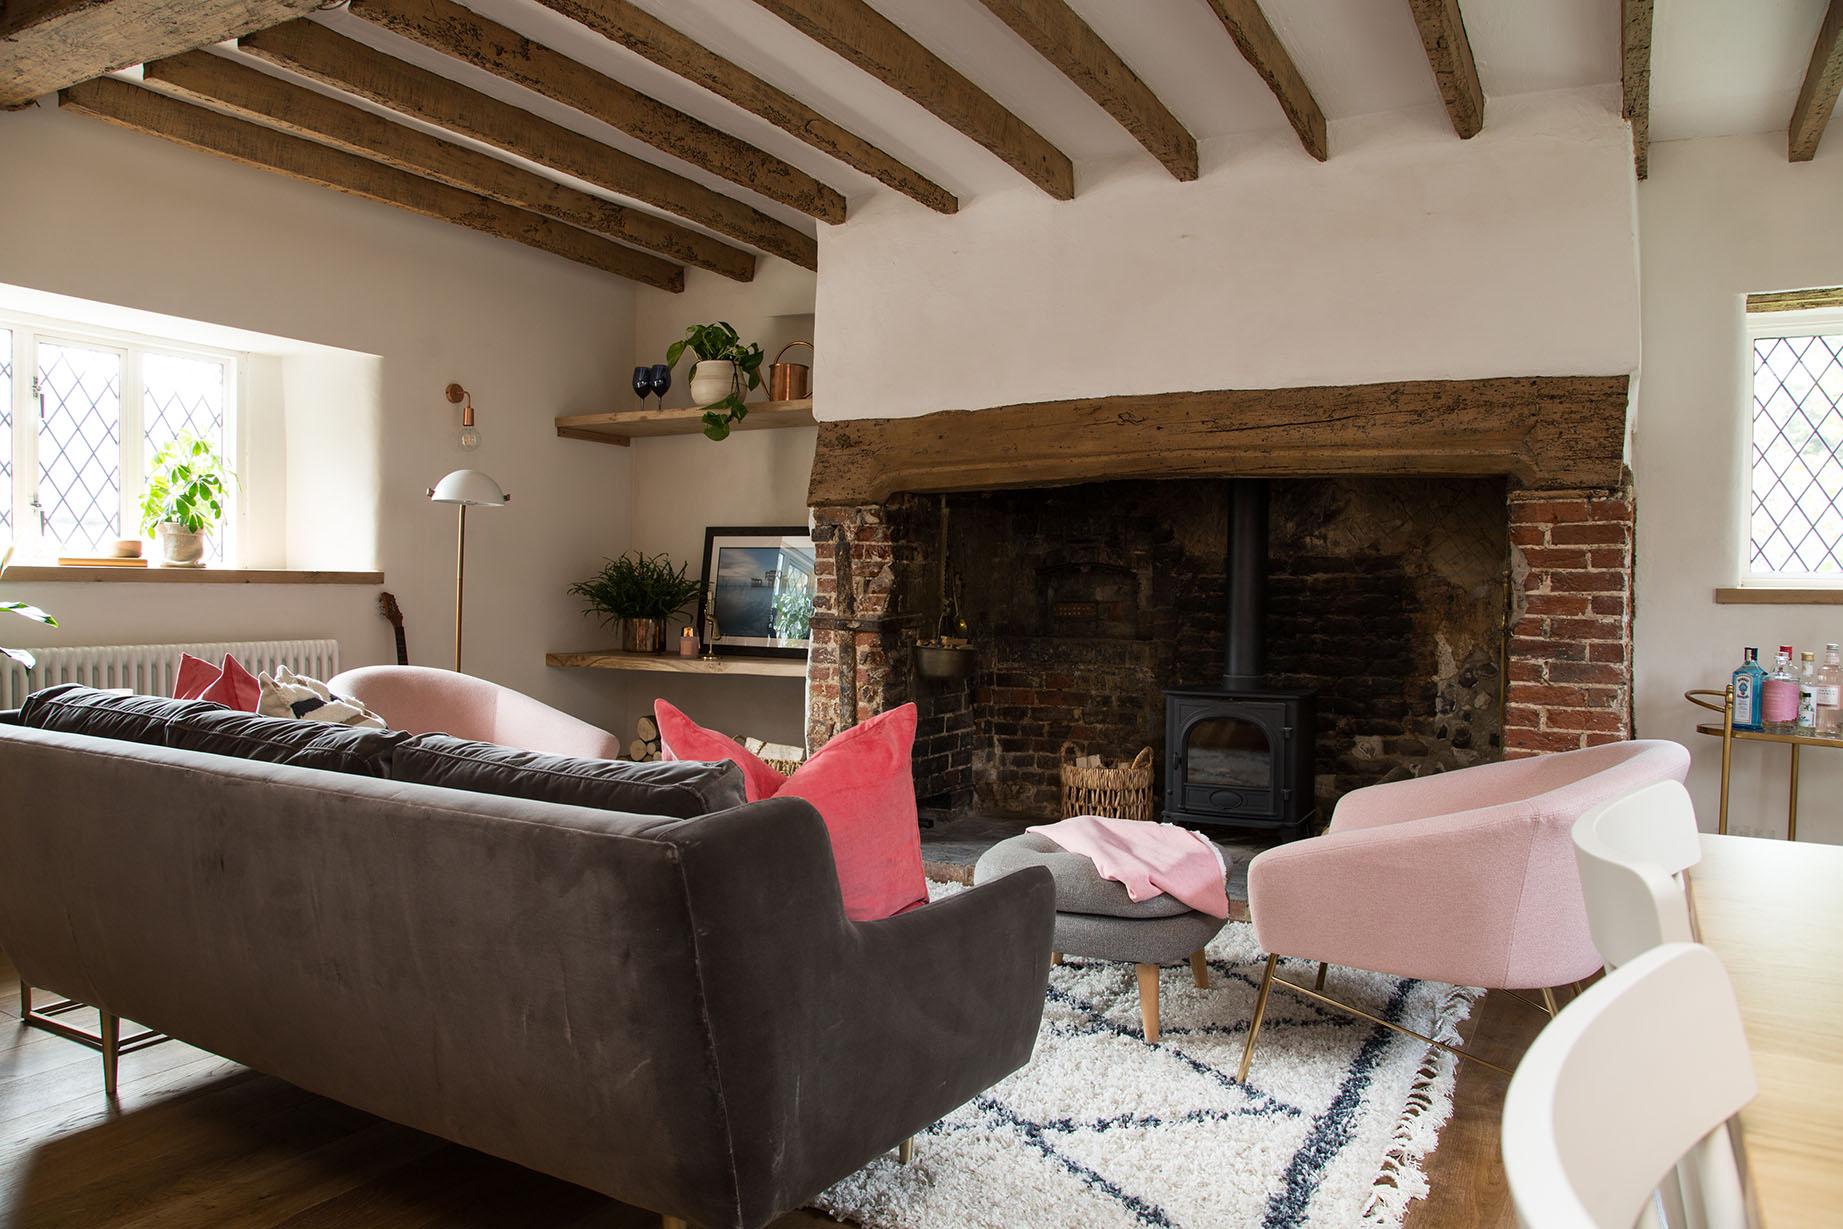 Living room showing warm oak finish